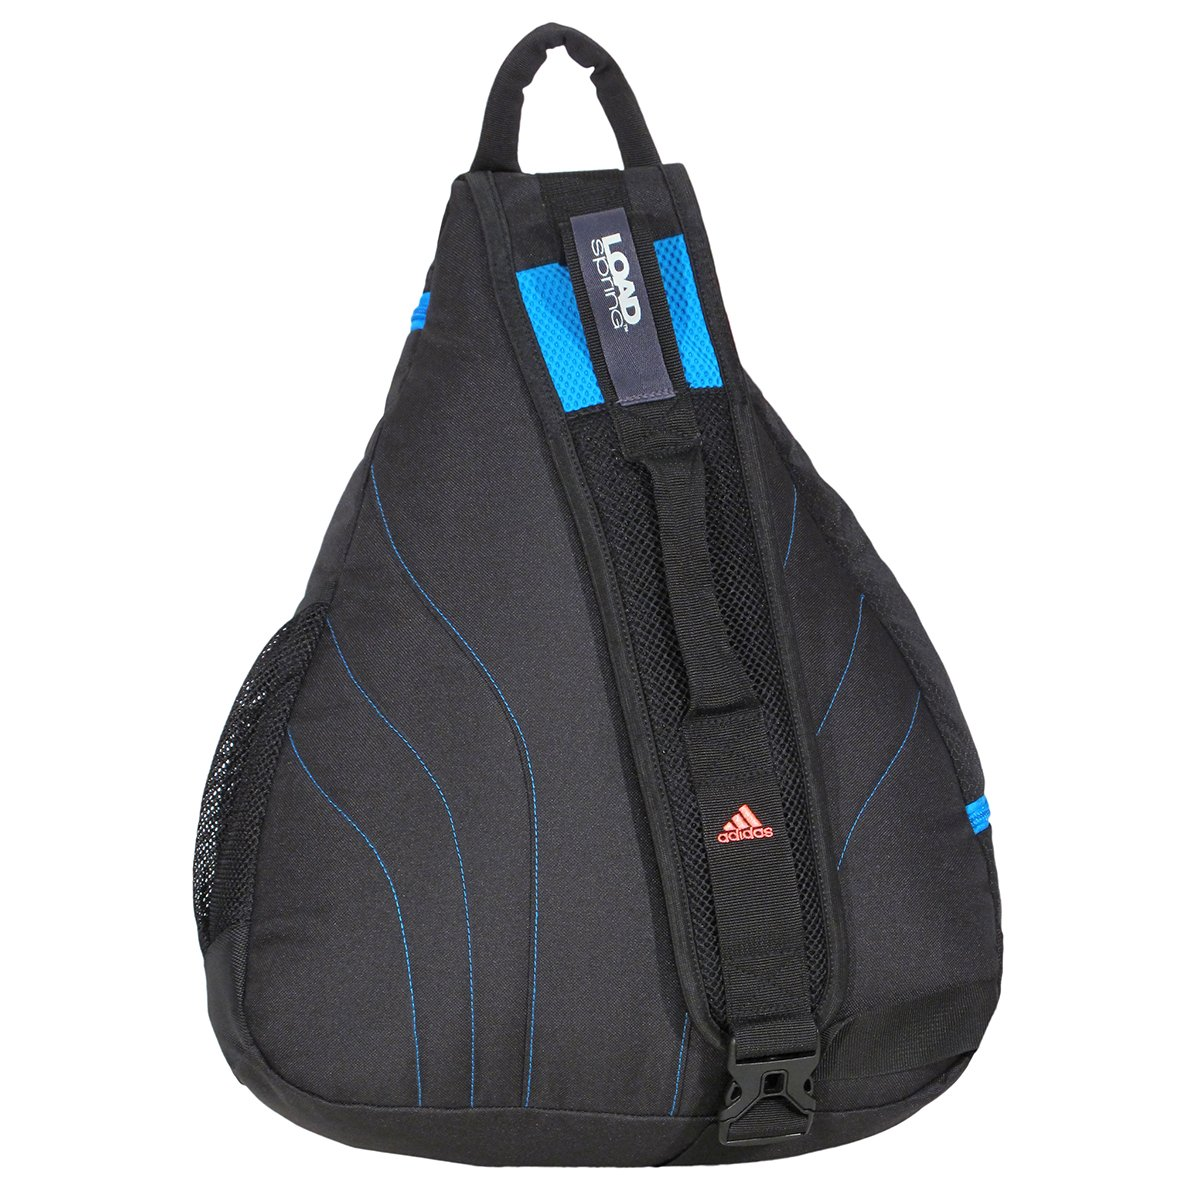 04dc5bc9e75 Amazon.com: adidas Shermer Sling Backpack, Black/Solar Blue/Red Zest, 19 1/4  x 14 x 7-Inch: Clothing